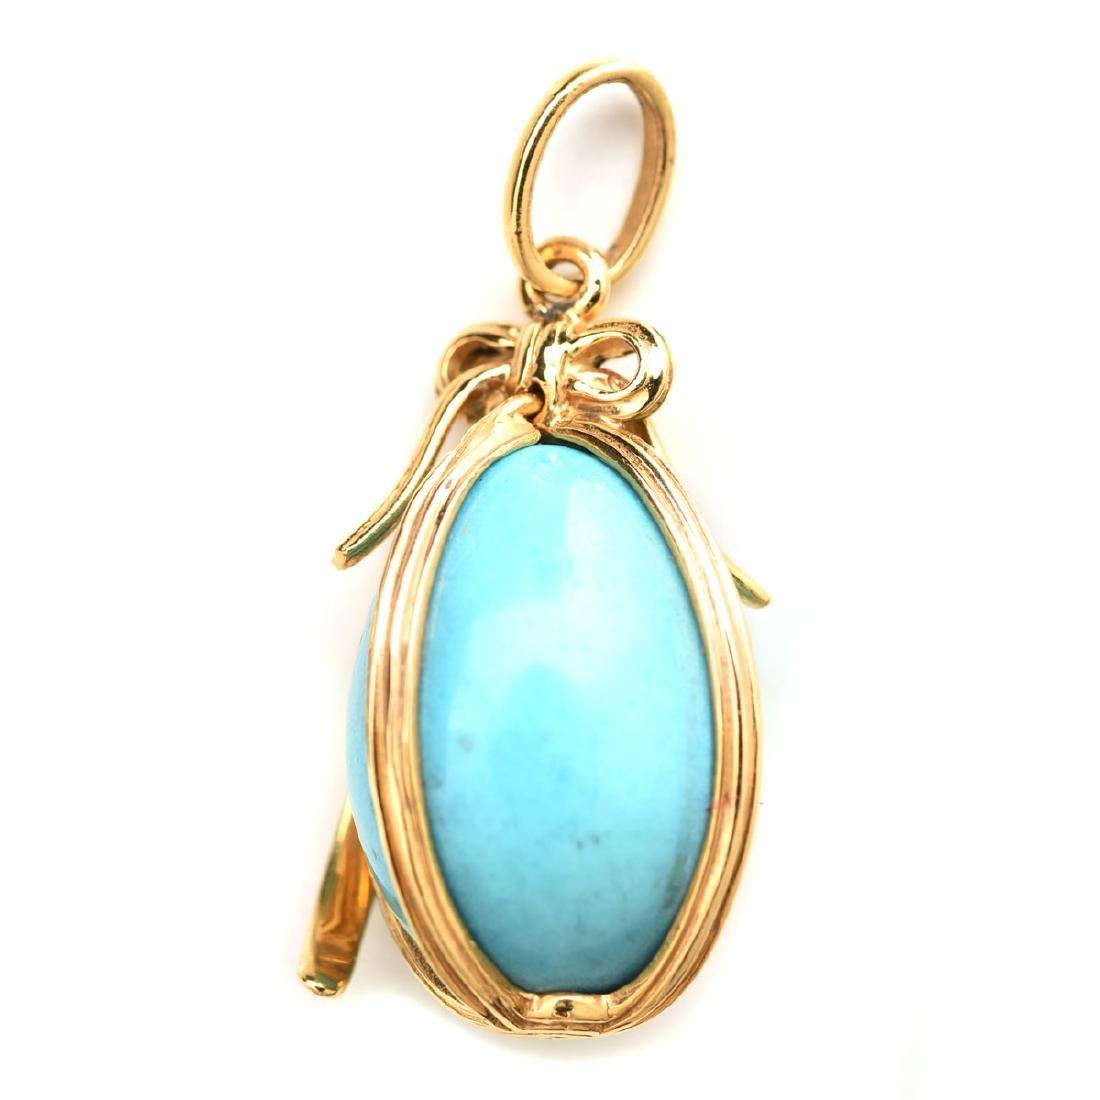 433c741c1bb5b Tiffany & Company Schlumberger Turquoise, 18k Yellow